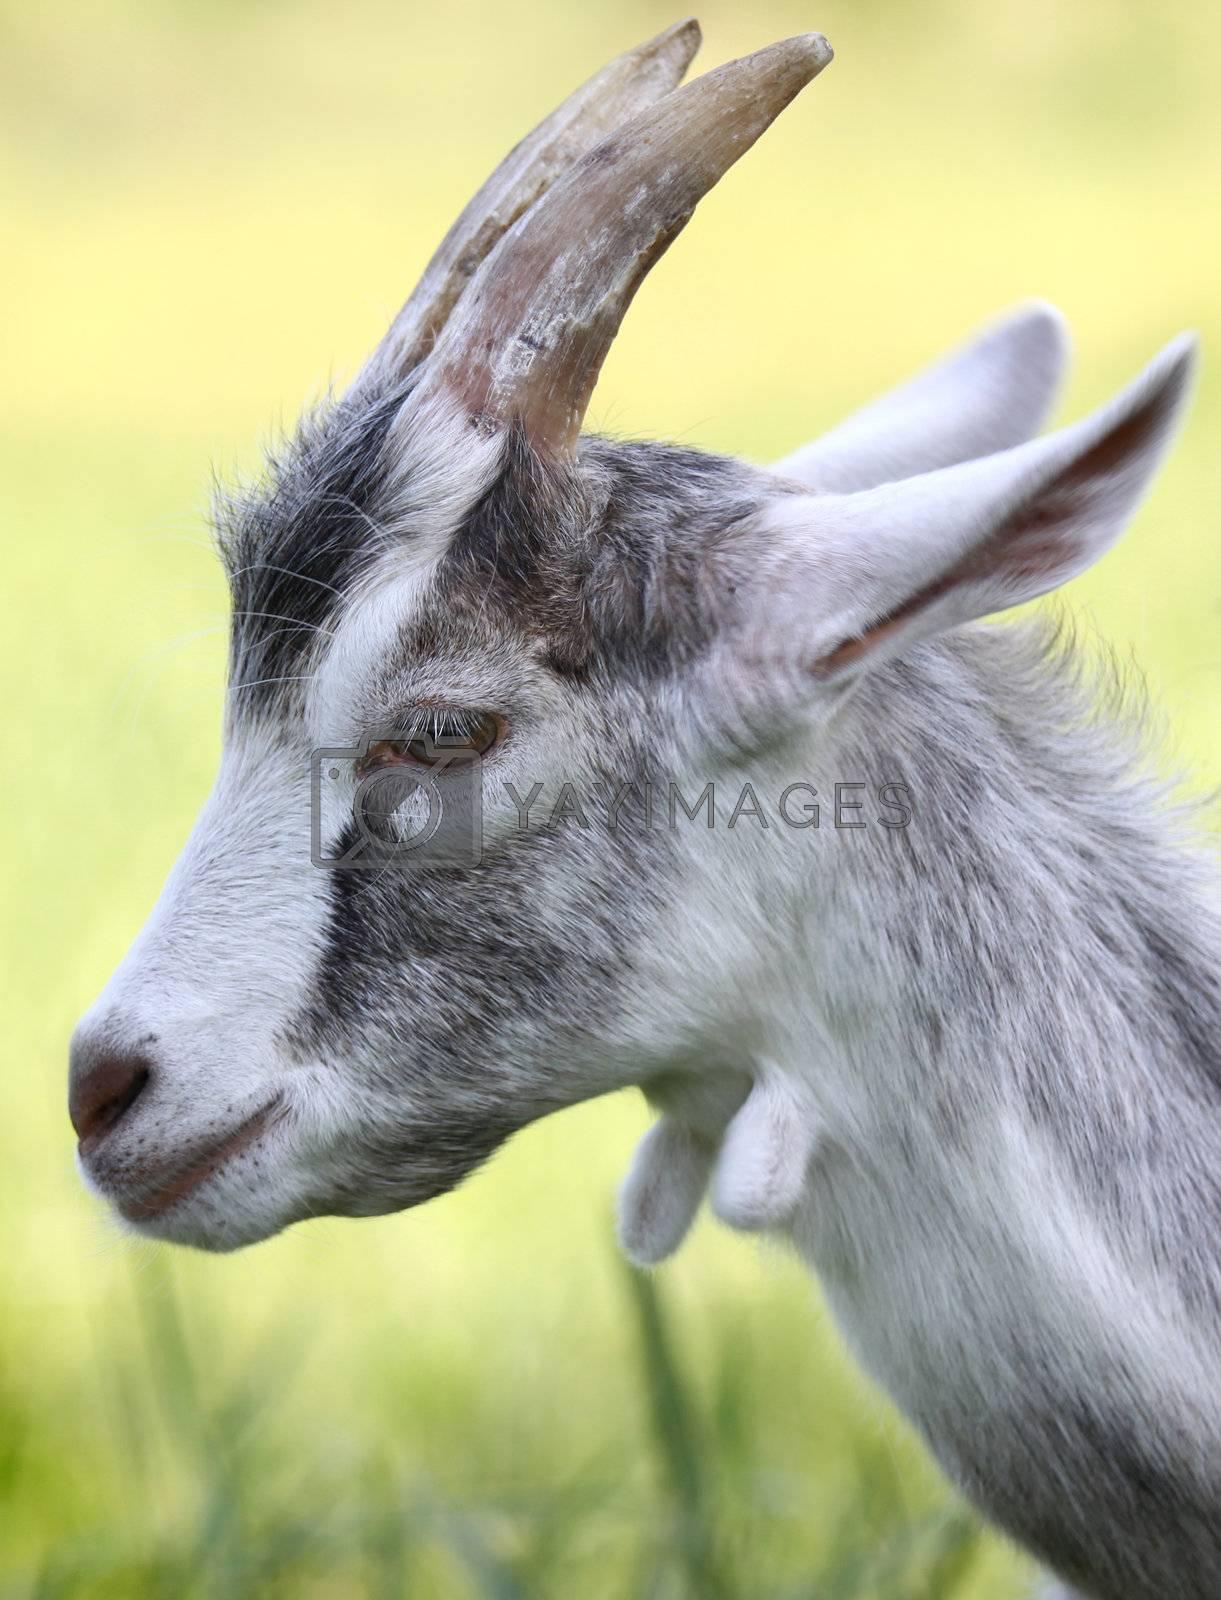 Horned goat by Cebas